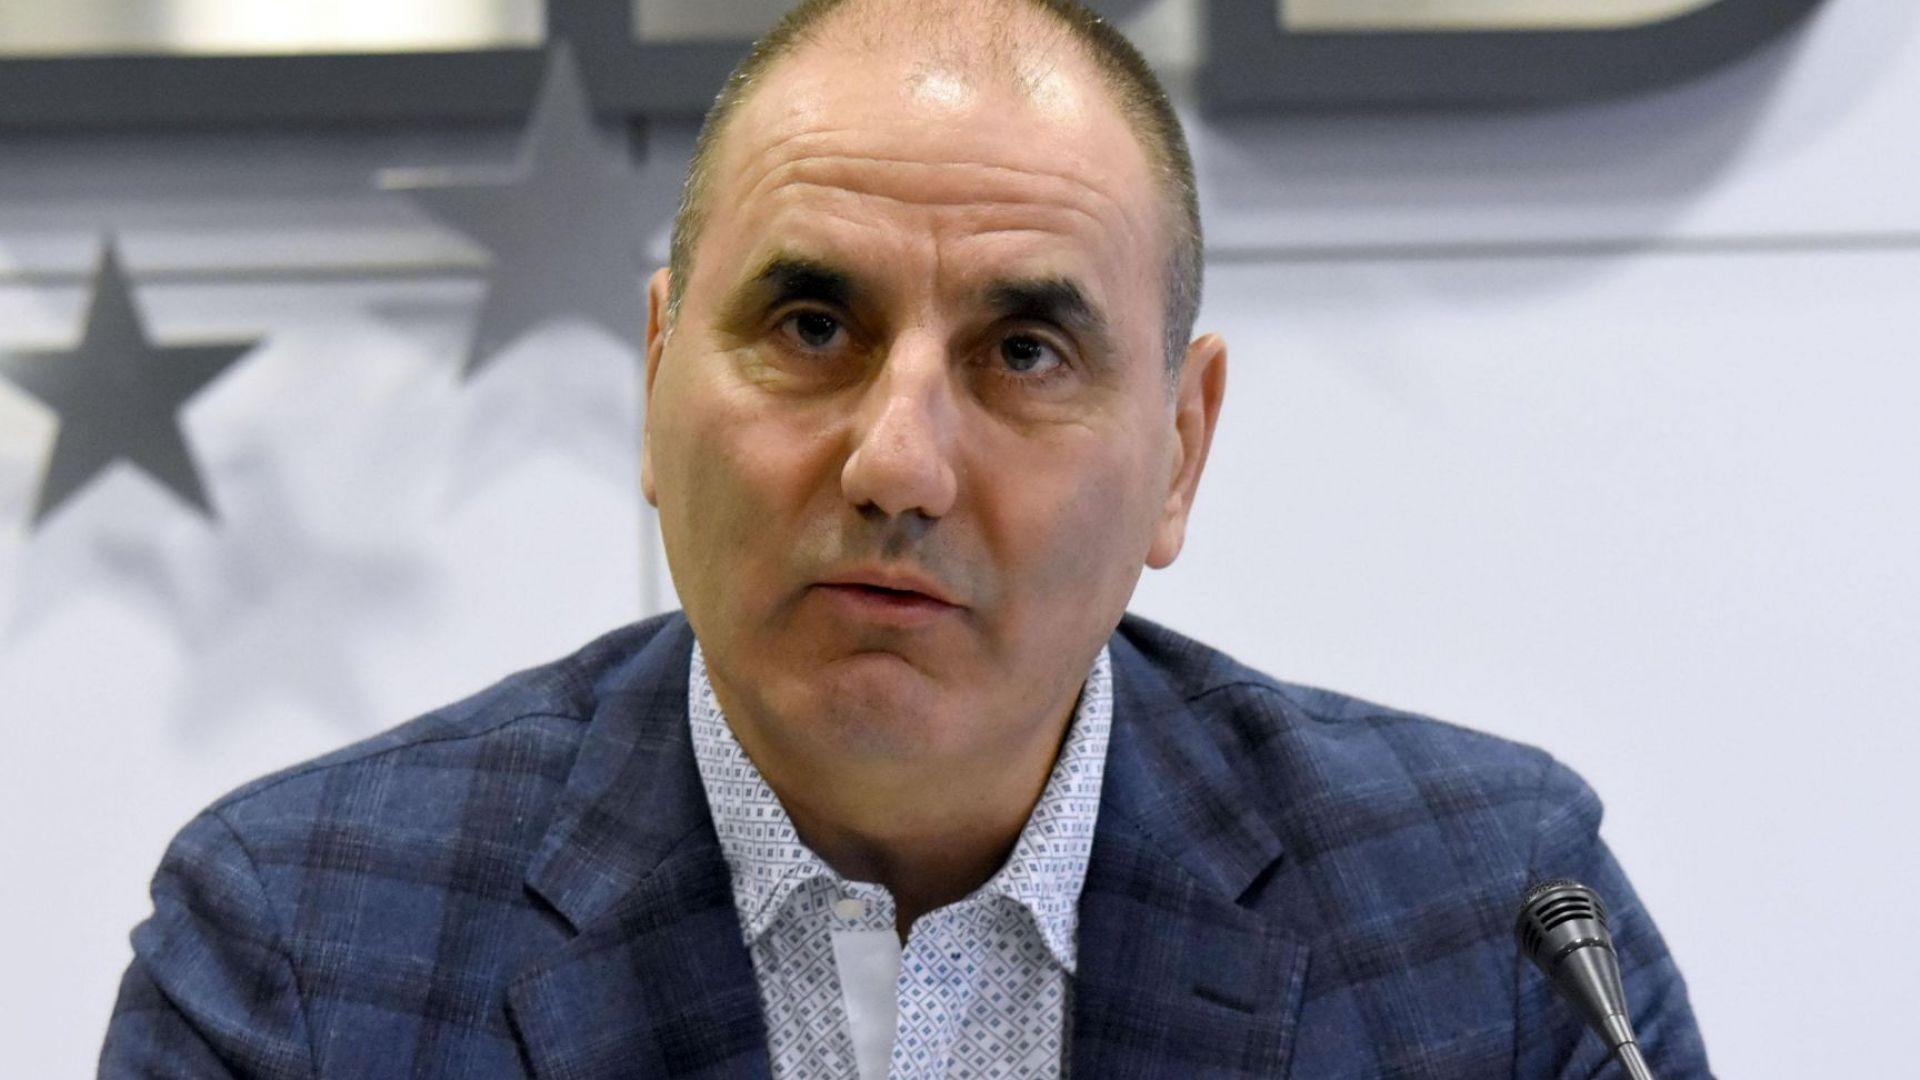 Цветанов: Летецът Радев щеше да подкрепи F-16, политикът Радев е зависим от БСП